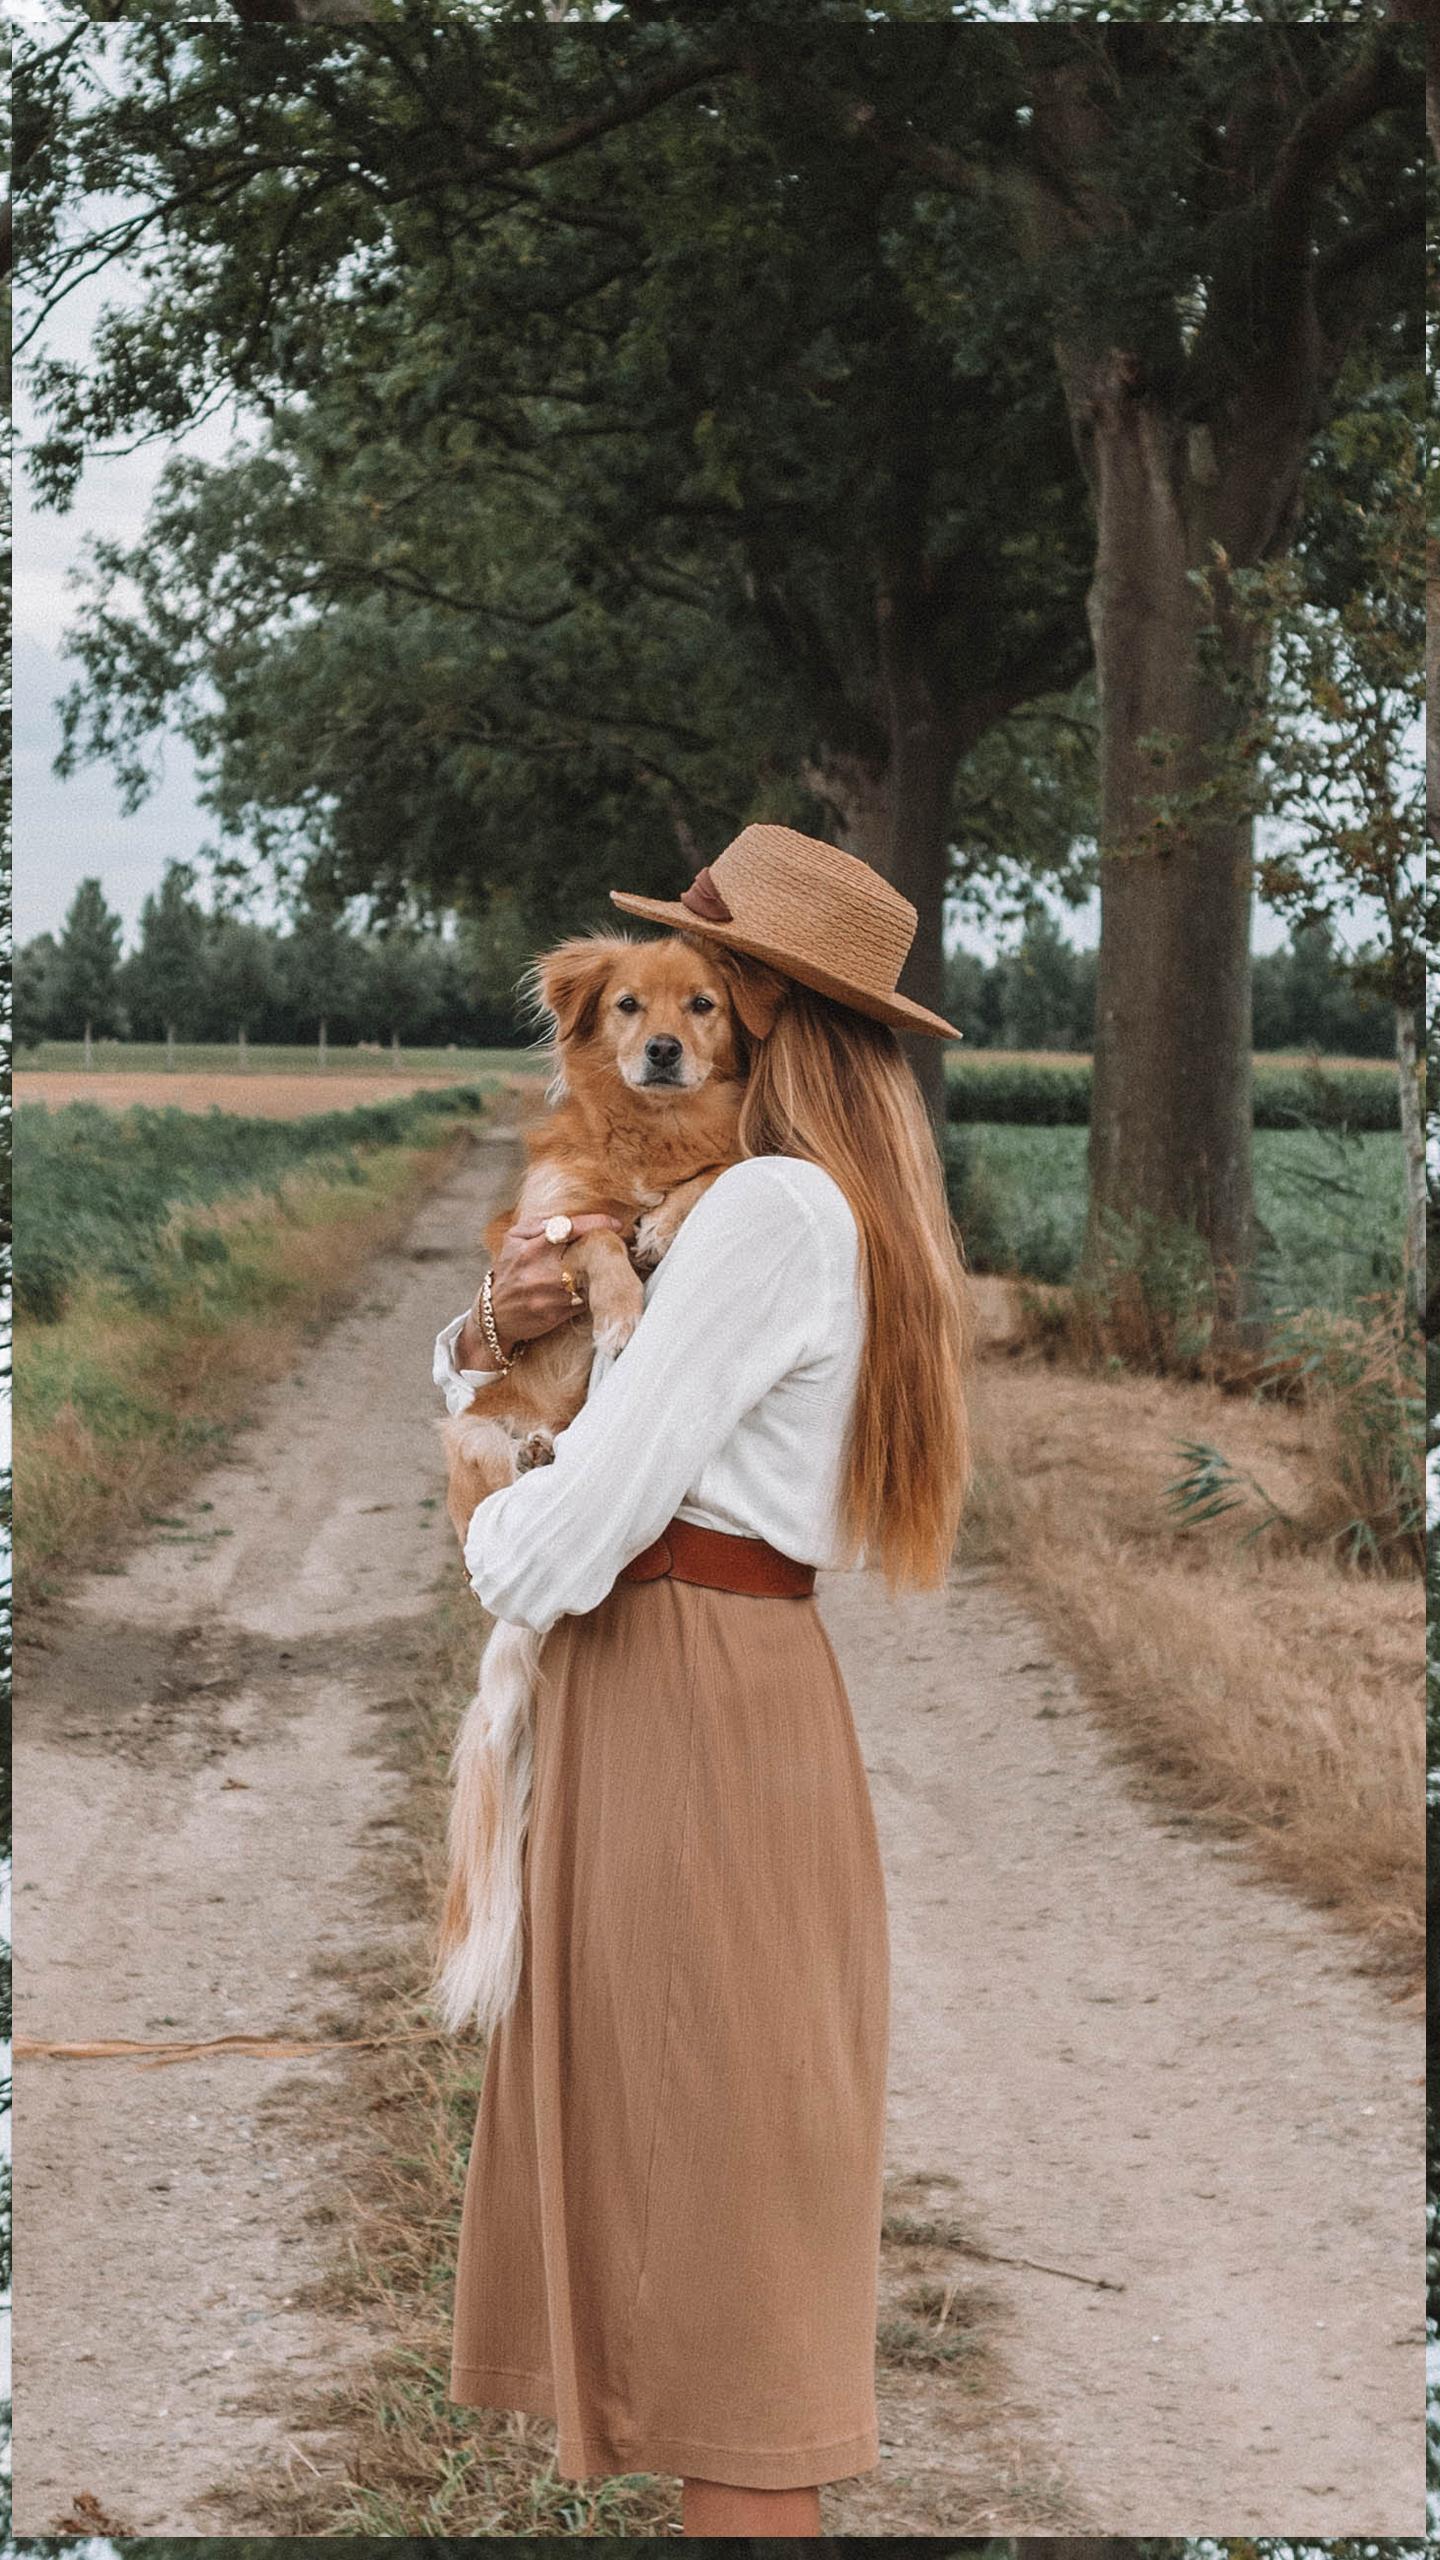 Moos Kokoni Linda's Wholesome Life hond adopteren